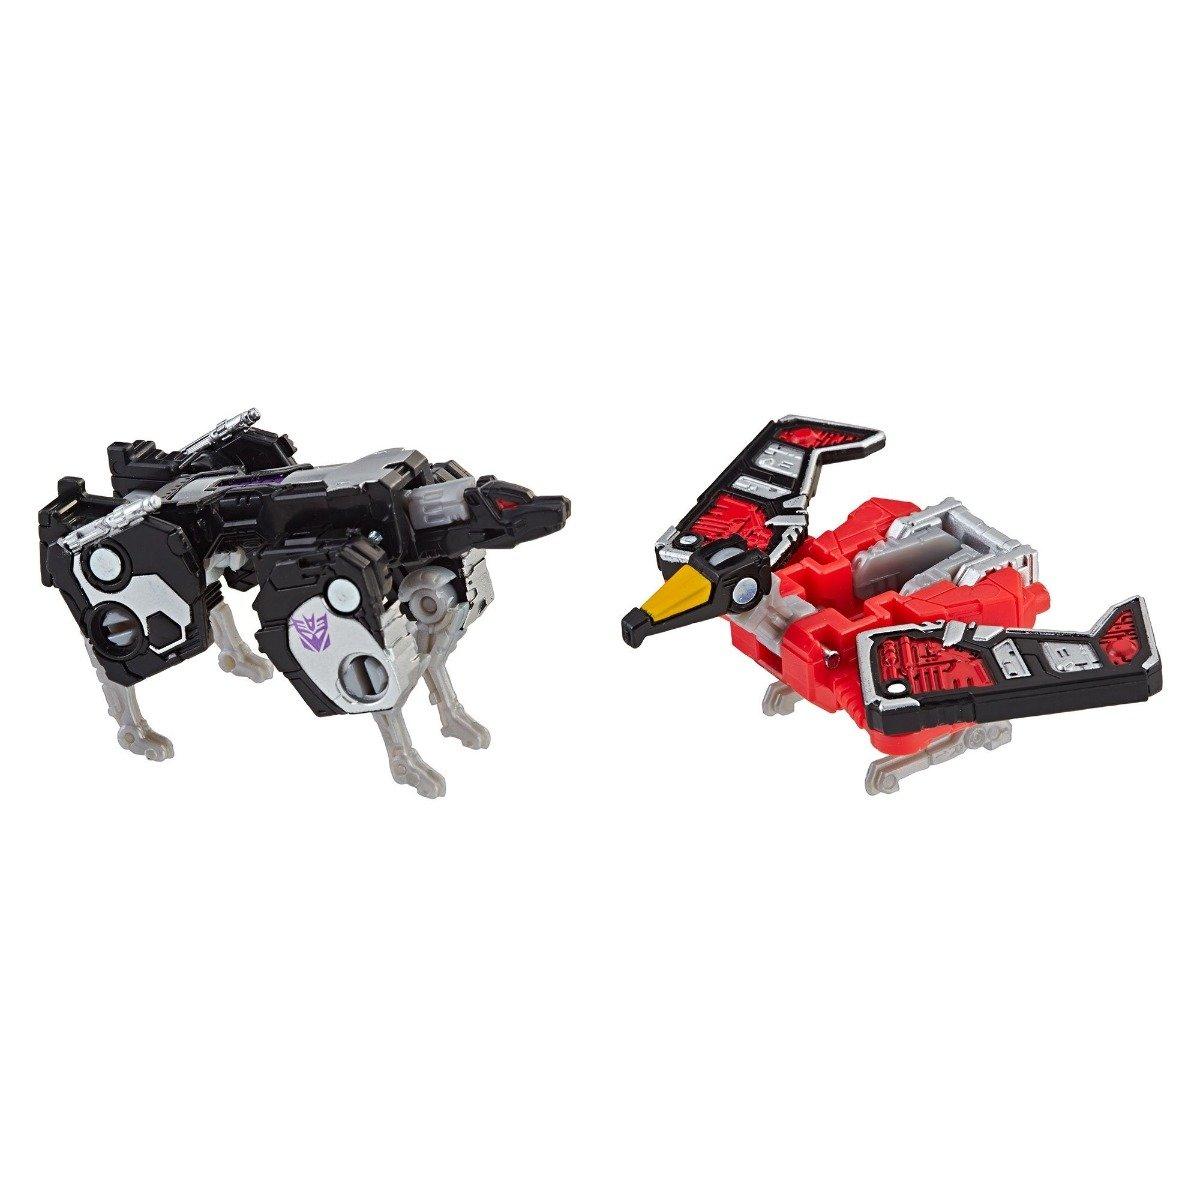 Figurina Transformers Micromaster WFC, Laserbeak, Ravage, E3561